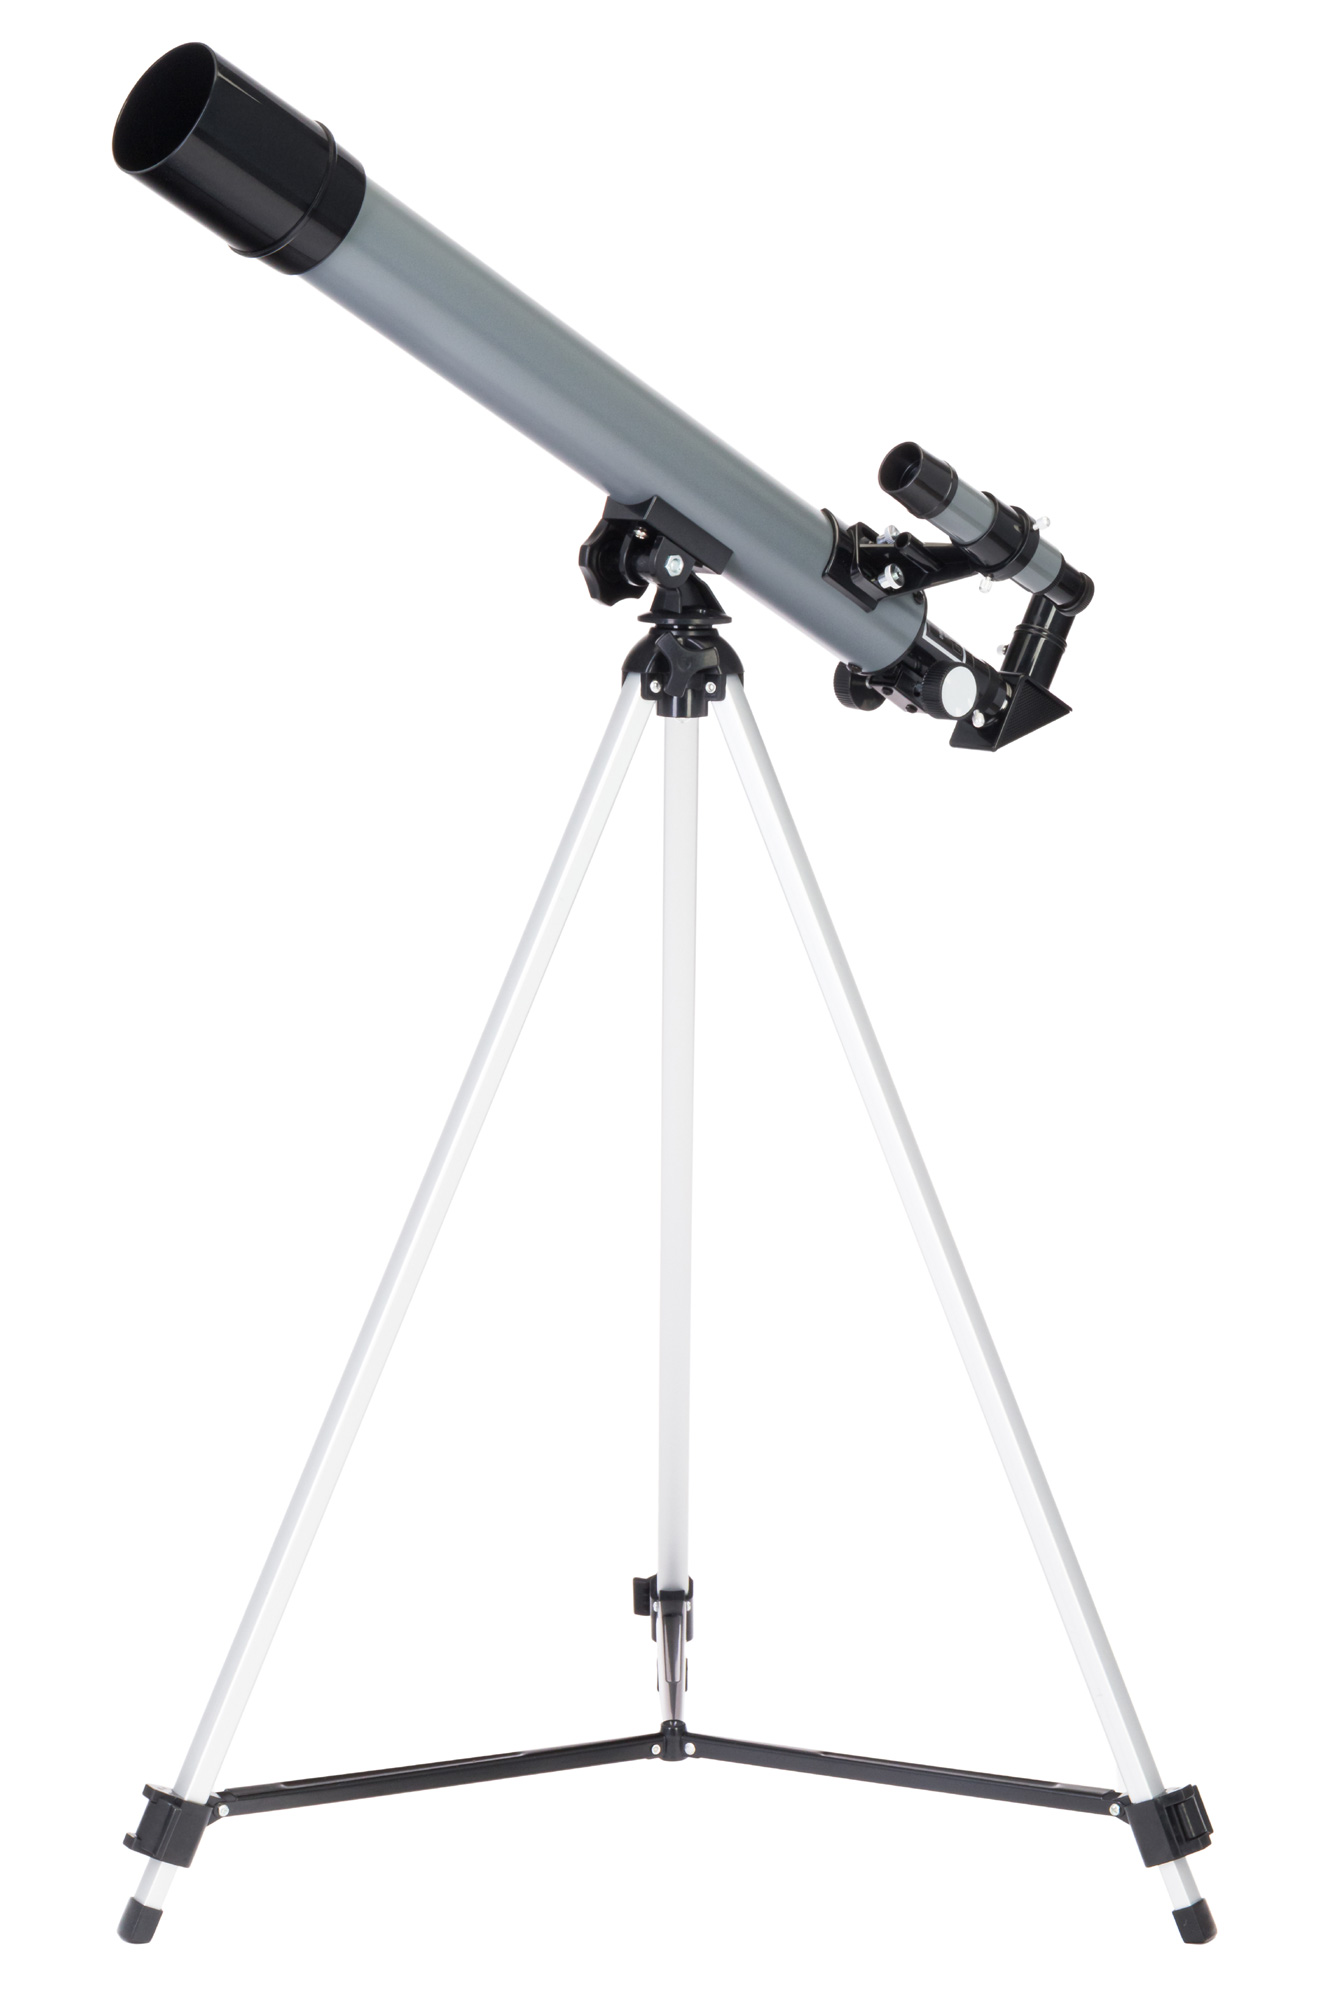 Картинка для Телескоп Levenhuk (Левенгук) Blitz 50 BASE